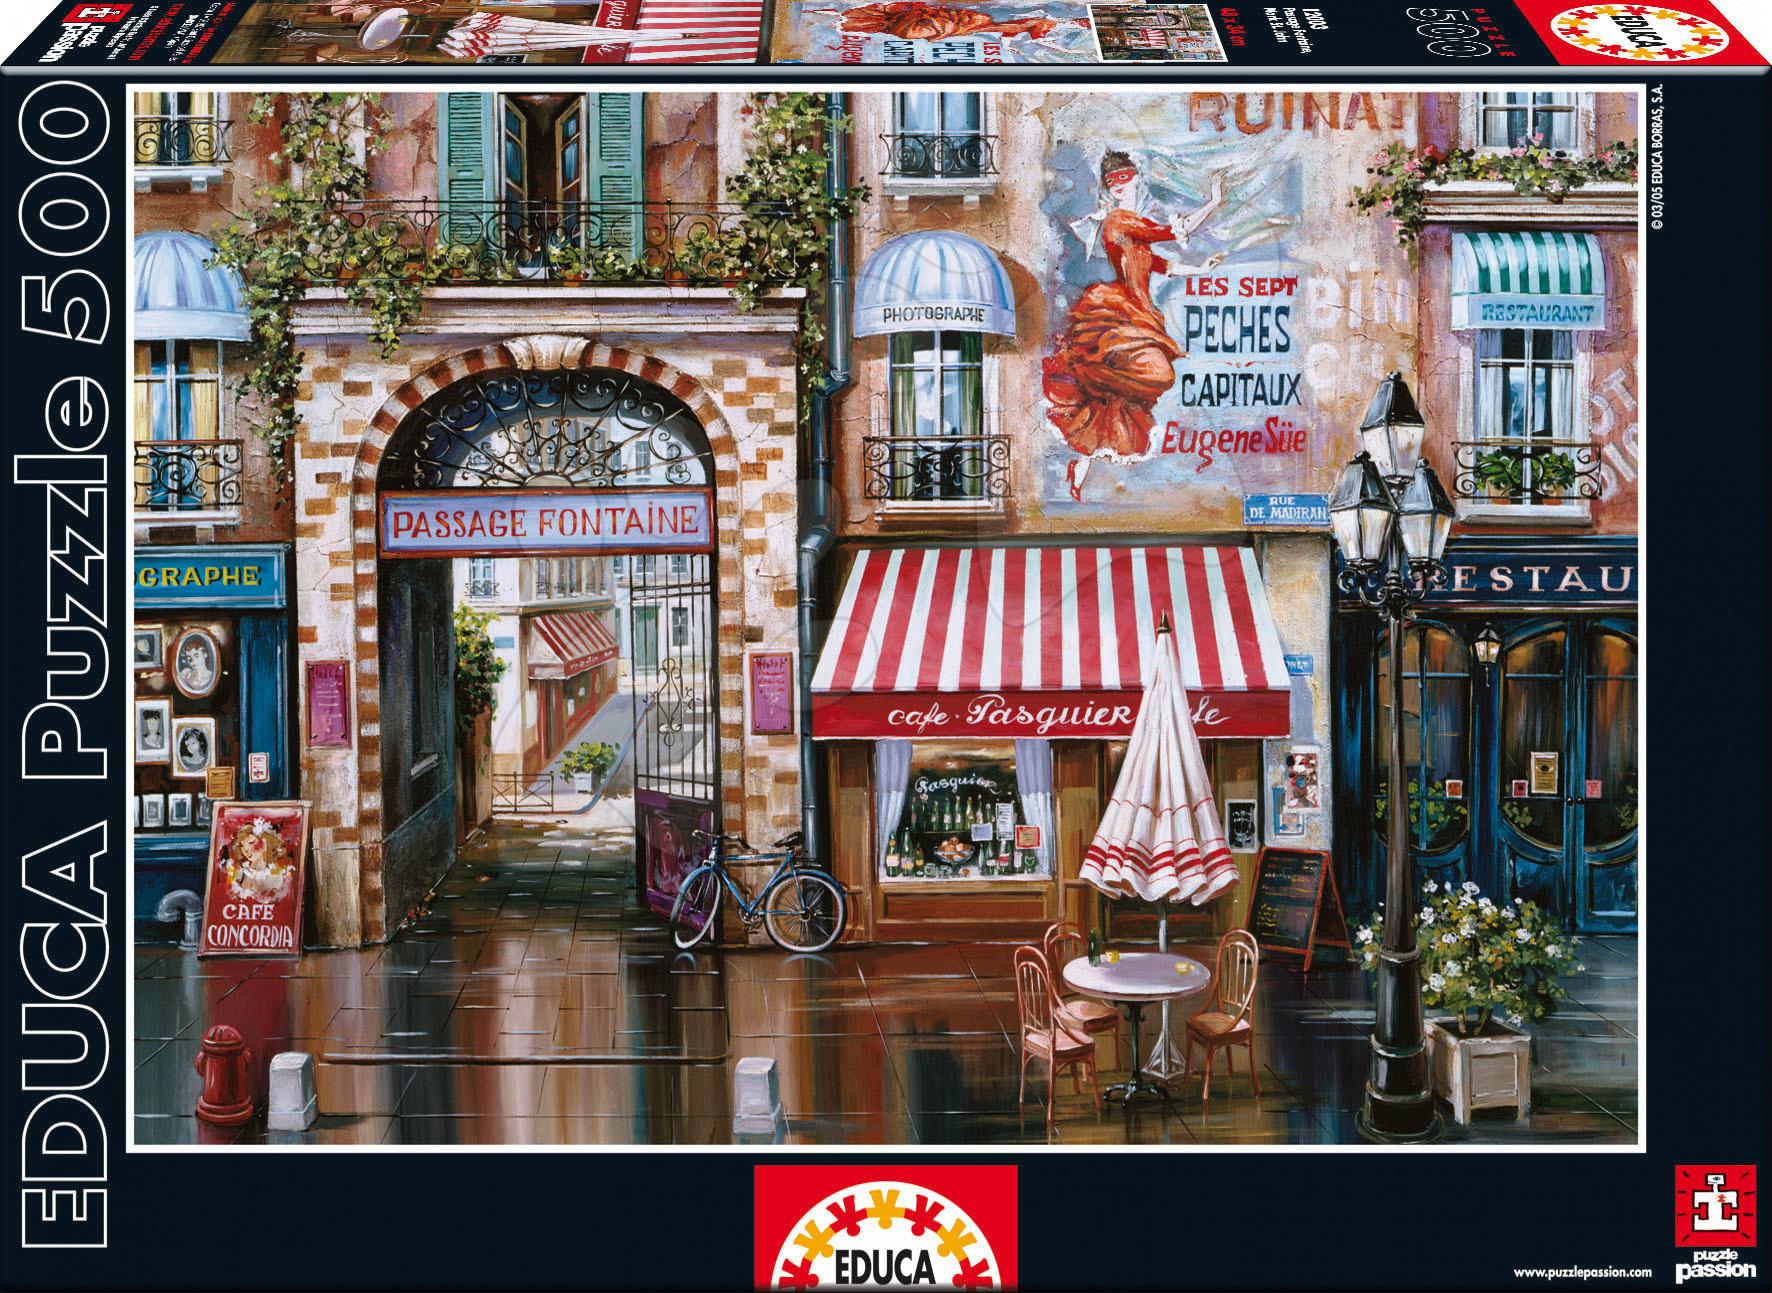 Puzzle 500 dílků - Puzzle Viktor Shvaiko Passage Fontaine Educa 500 dílků od 11 let